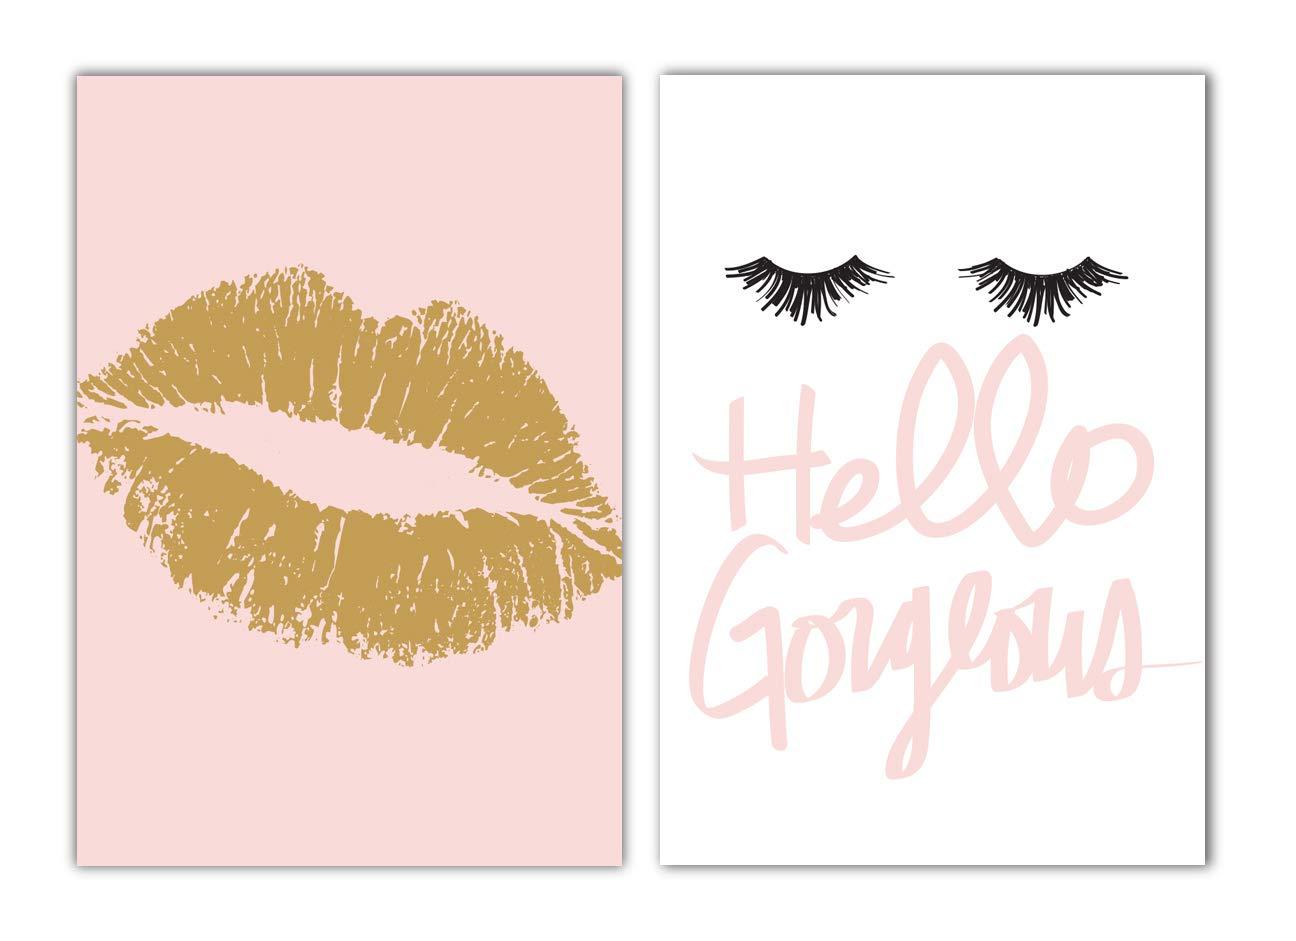 Designs by Maria Inc. Set of 2 Fashionista Prints (Unframed) Lips & Lashes Wall Art Makeup Bathroom Decor (11x17) (Option 3)